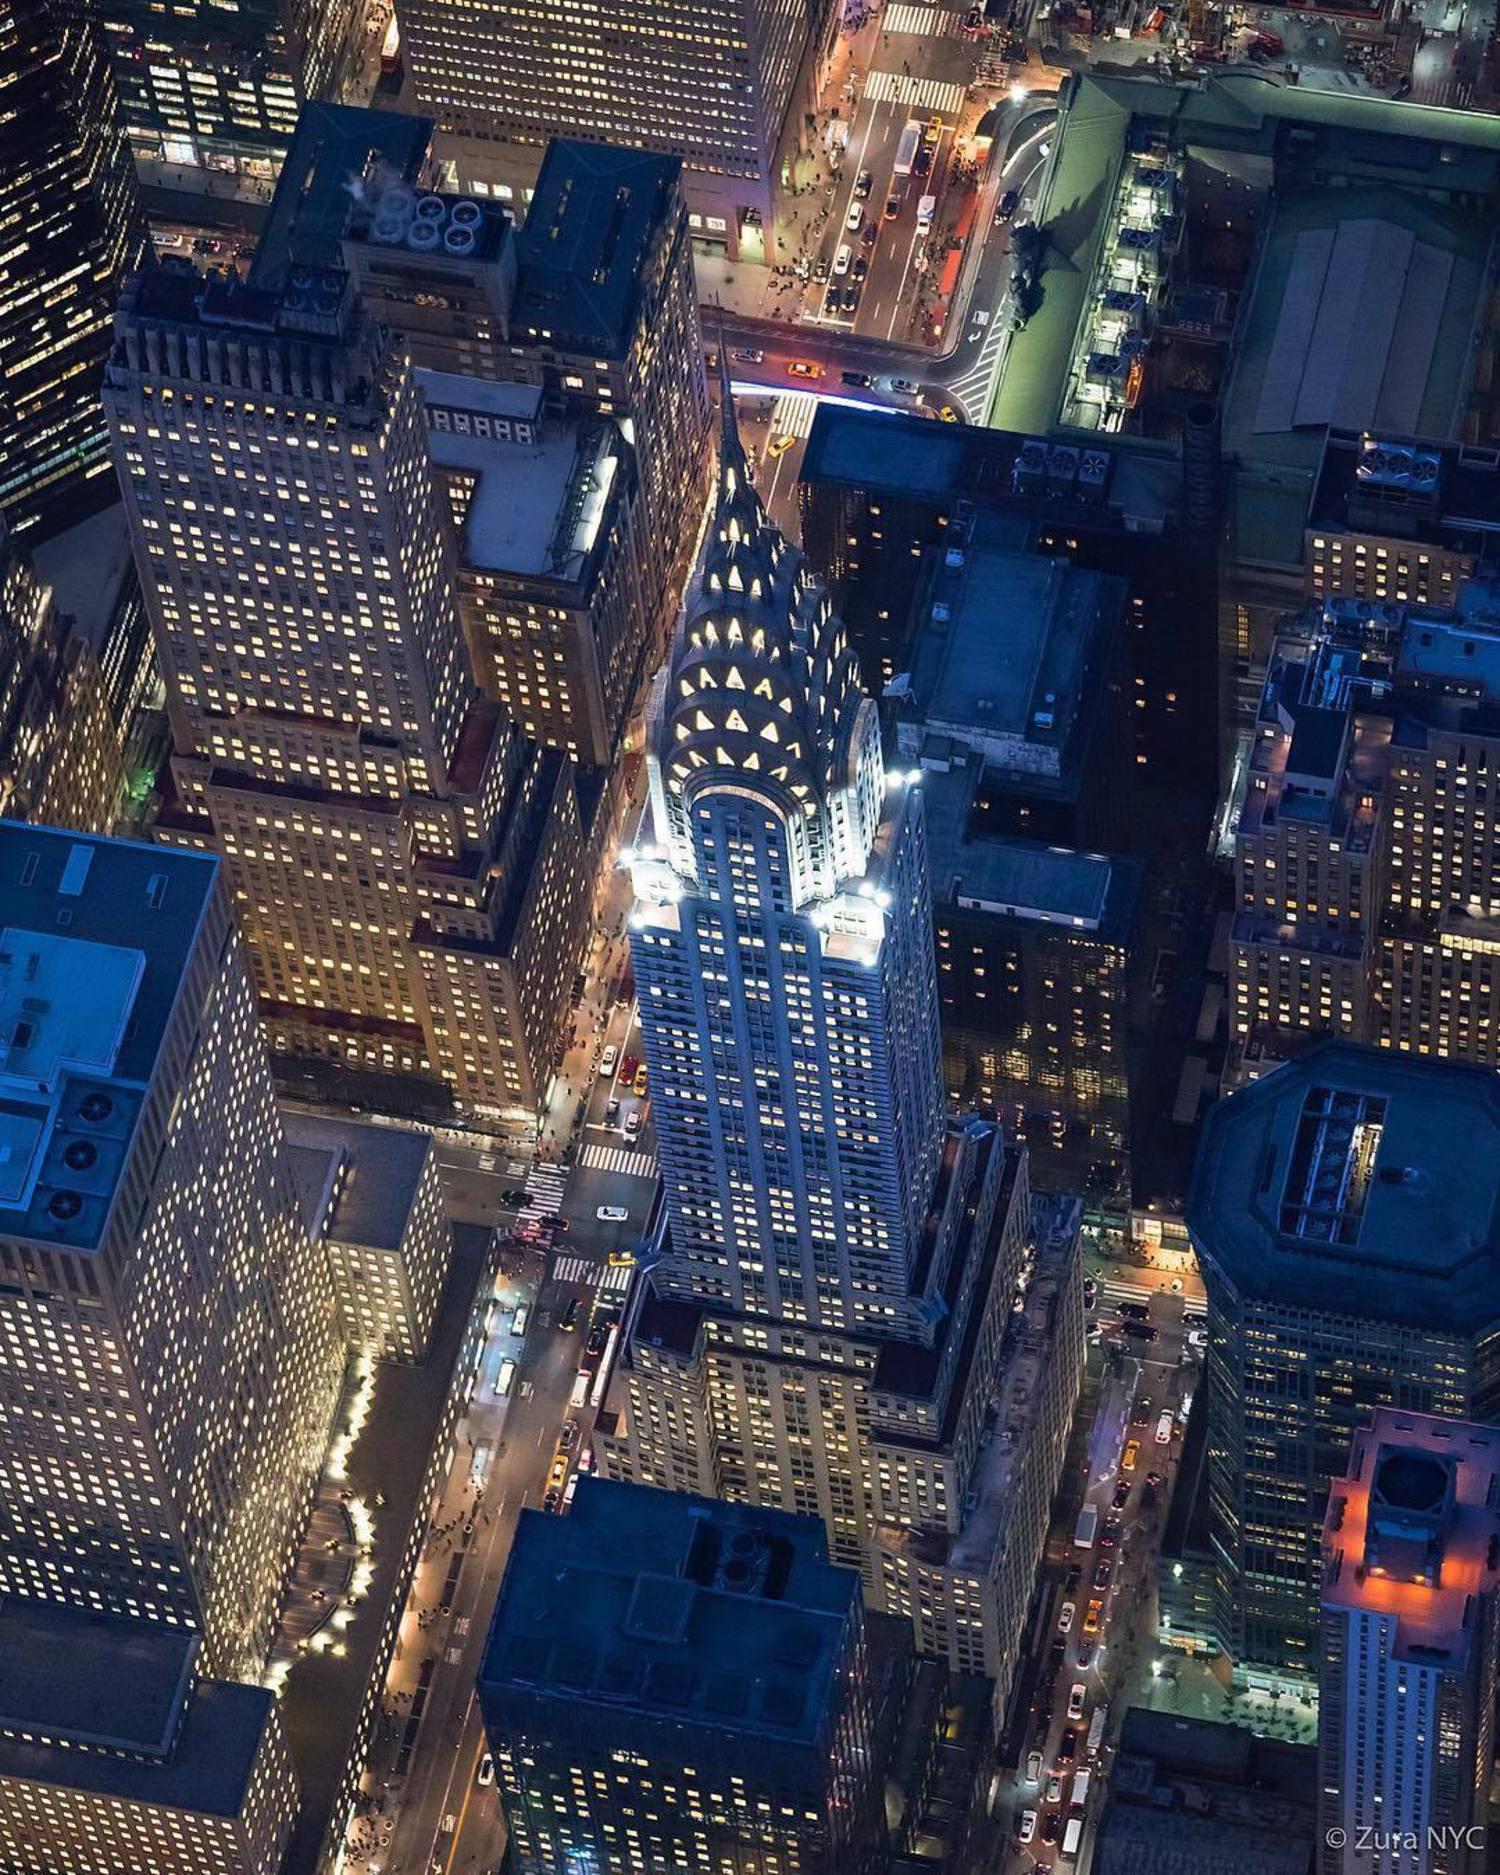 Chrysler Building, Manhattan. Photo via @zura.nyc #viewingnyc #nyc #newyork #newyorkcity #chryslerbuilding